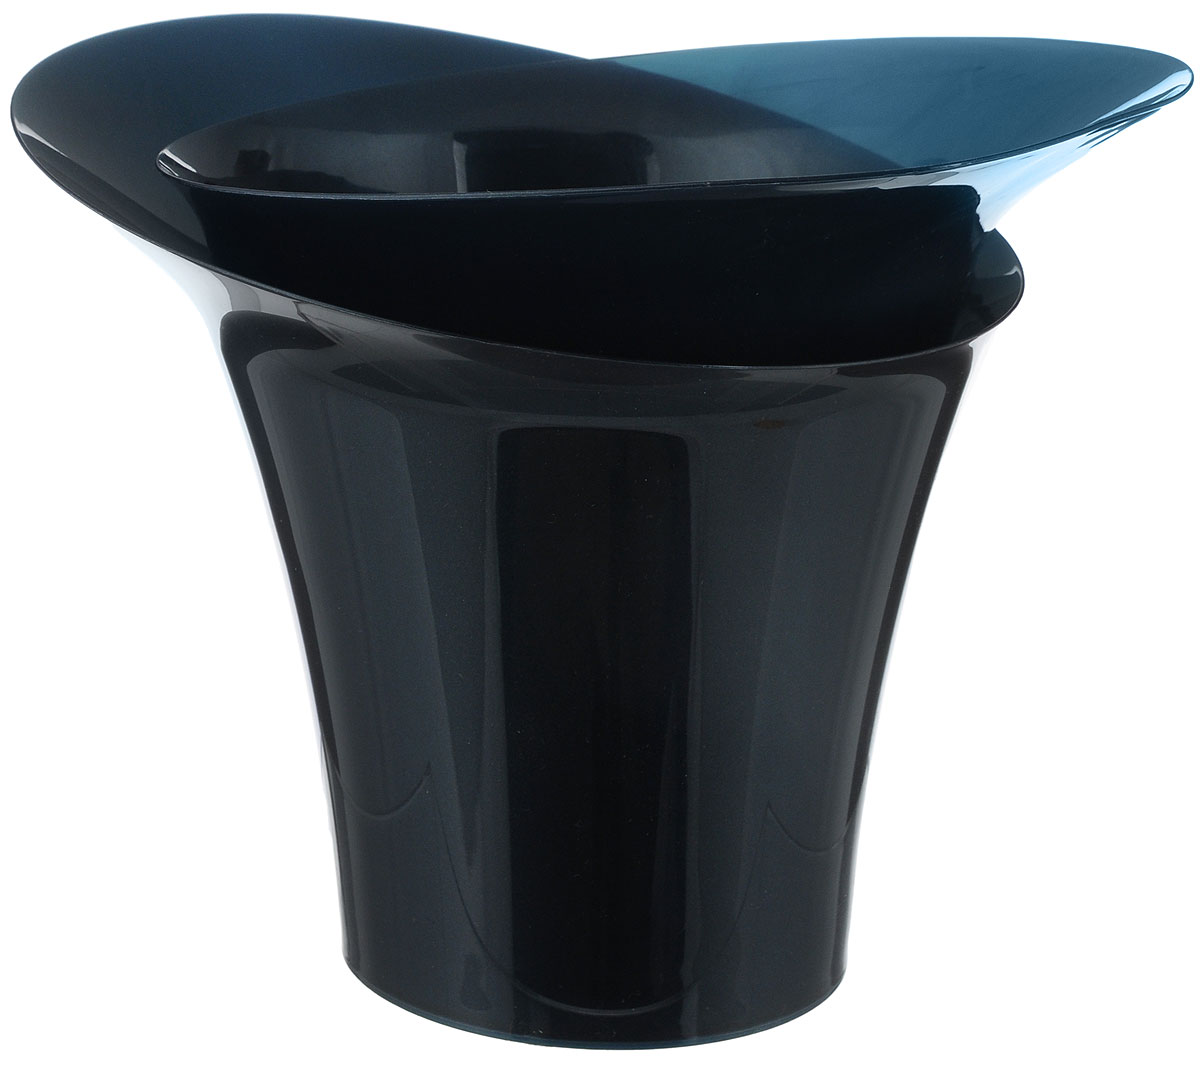 "Горшок для цветов Техоснастка ""Модерн"", цвет: темно-синий, 2,5 л"